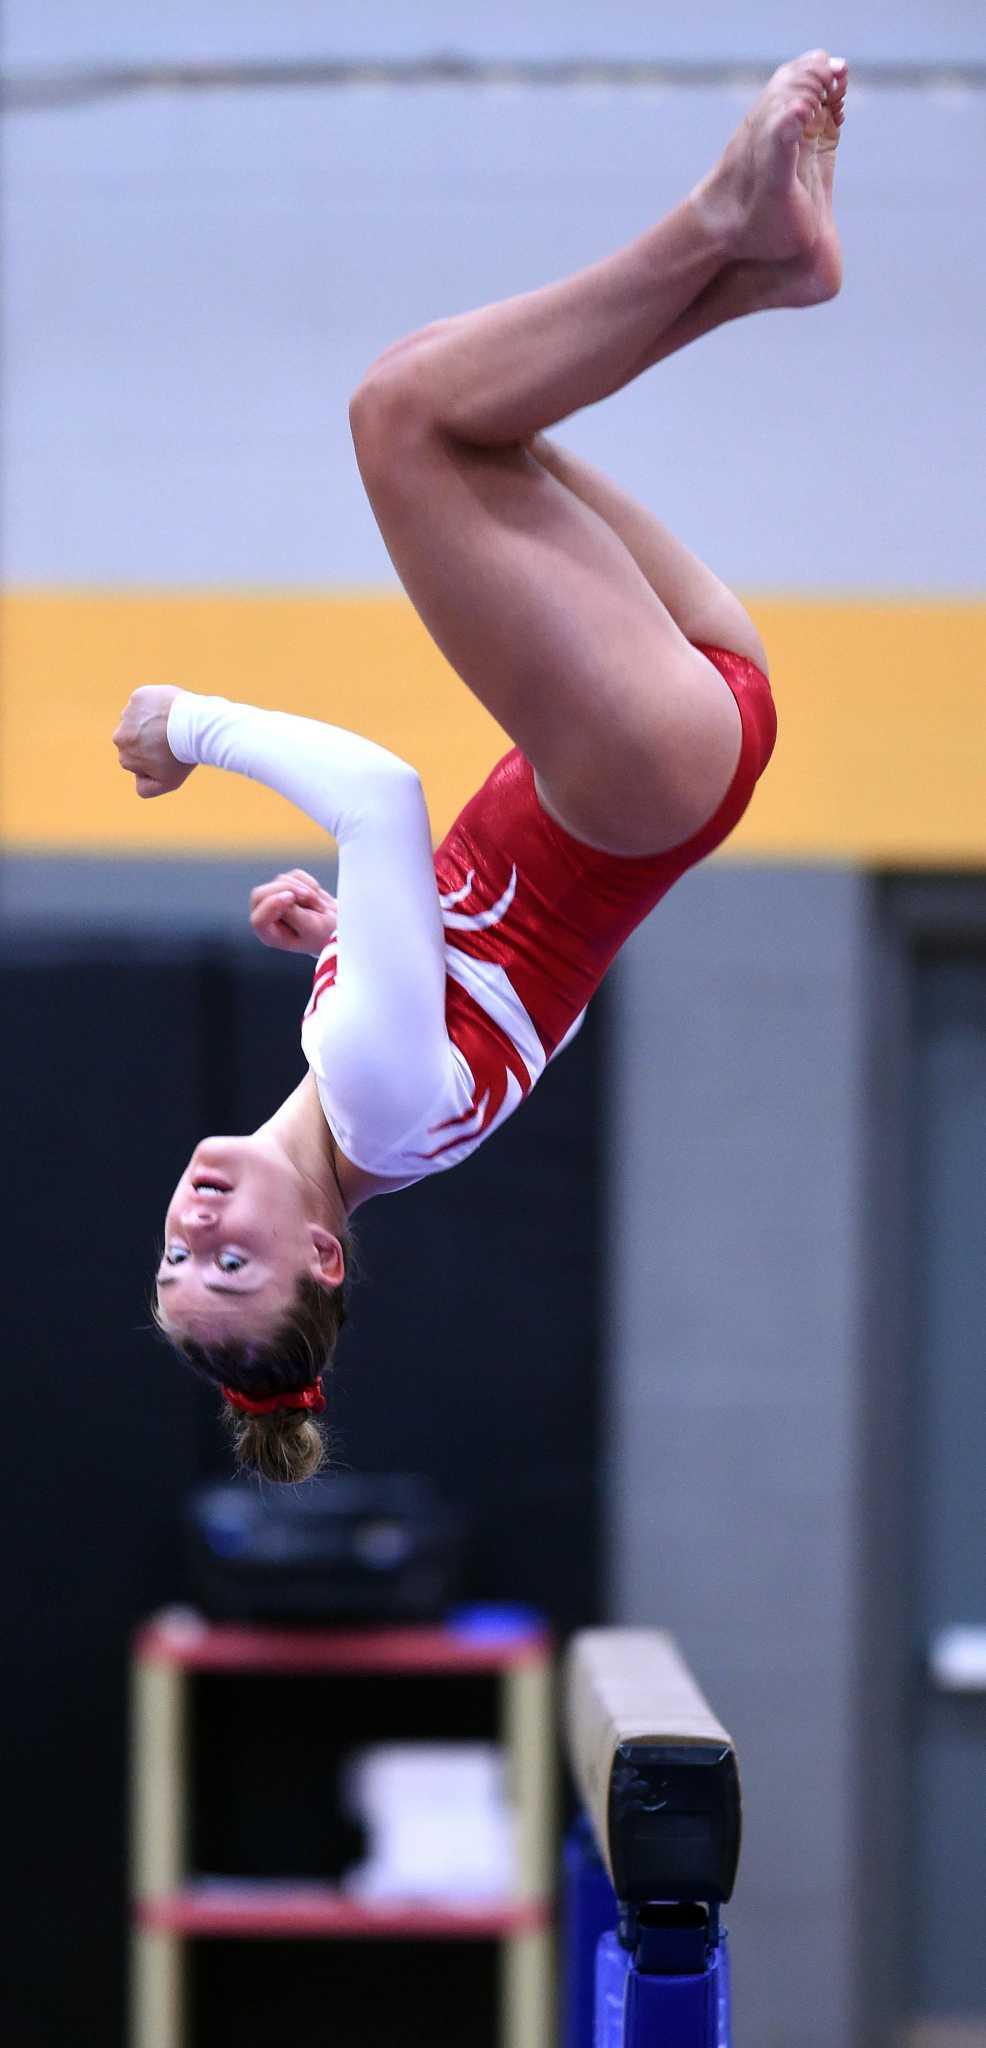 Pin by Erin DeBoer on Gymnastics - Uneven Bars